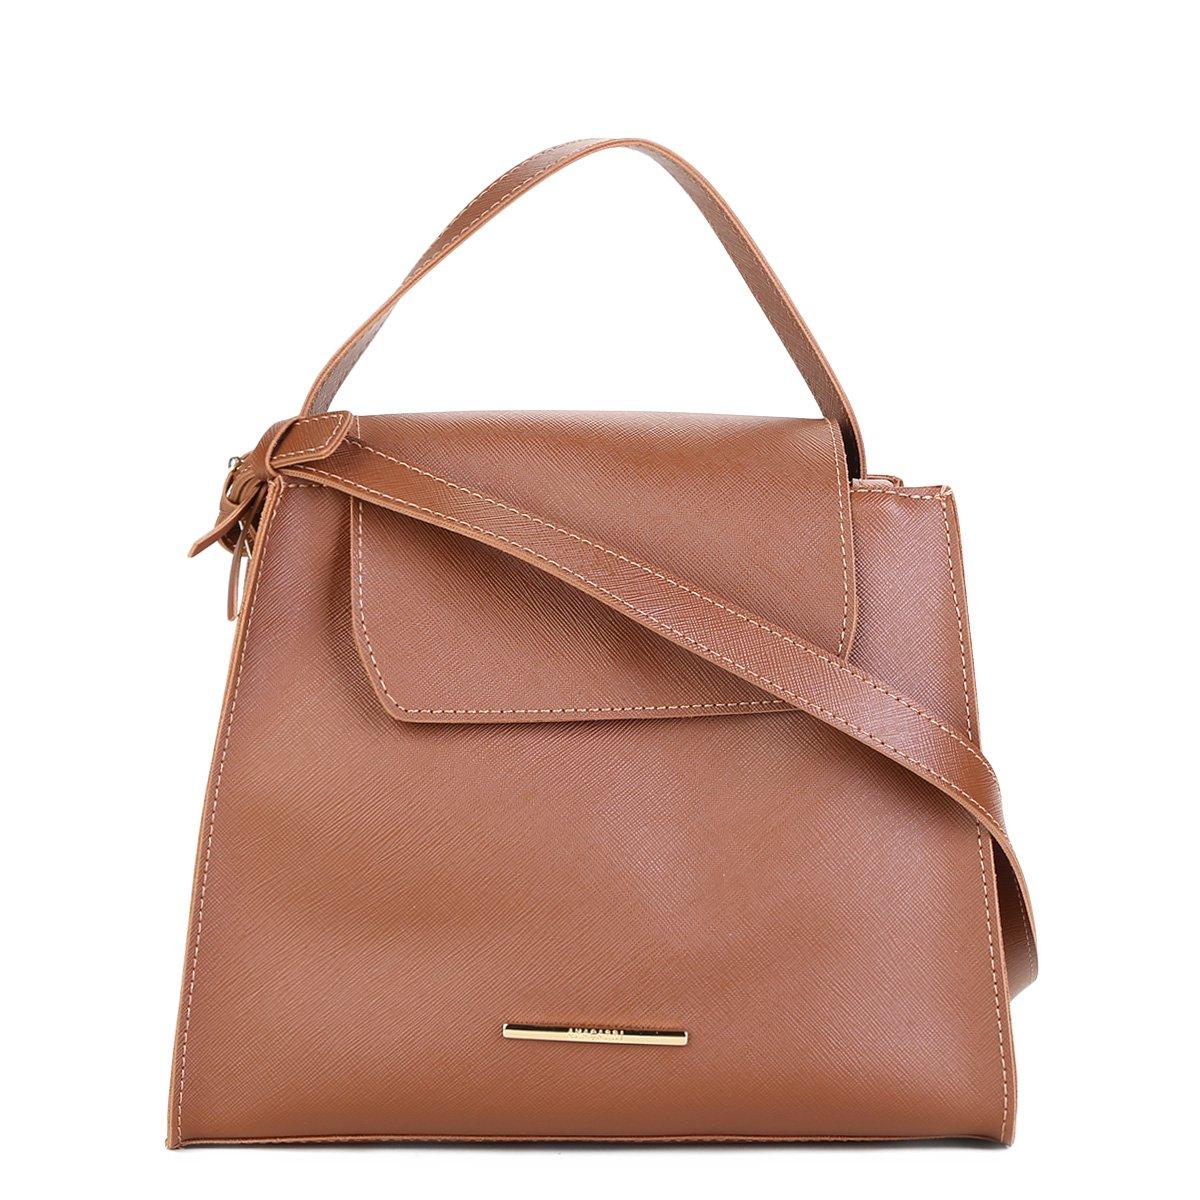 d7344b27fe Bolsa Anacapri Safiano Capri Handbag Feminina